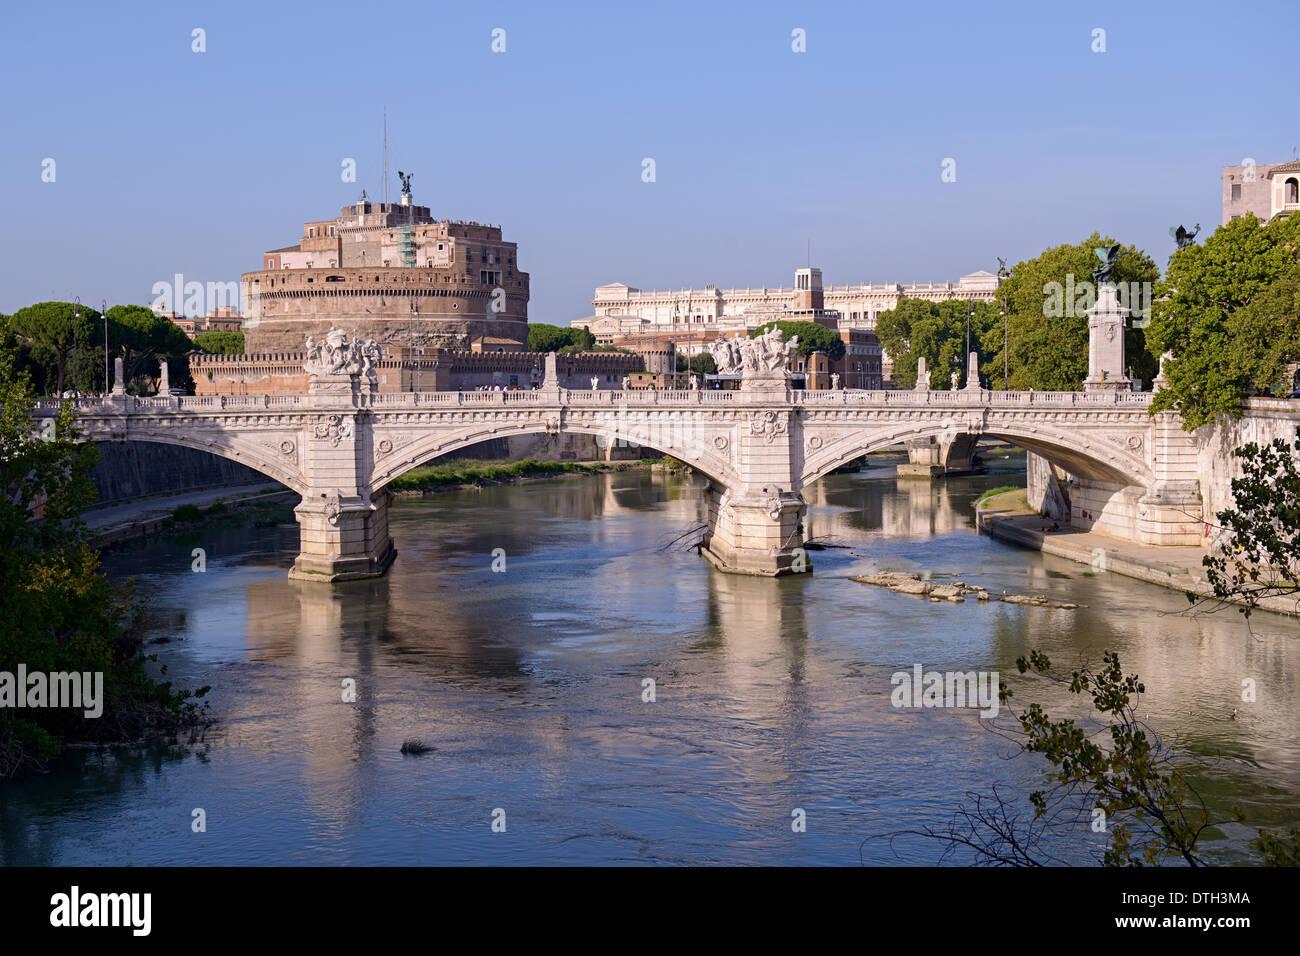 Vittorio Emanuele II bridge over the Tiber river Stock Photo